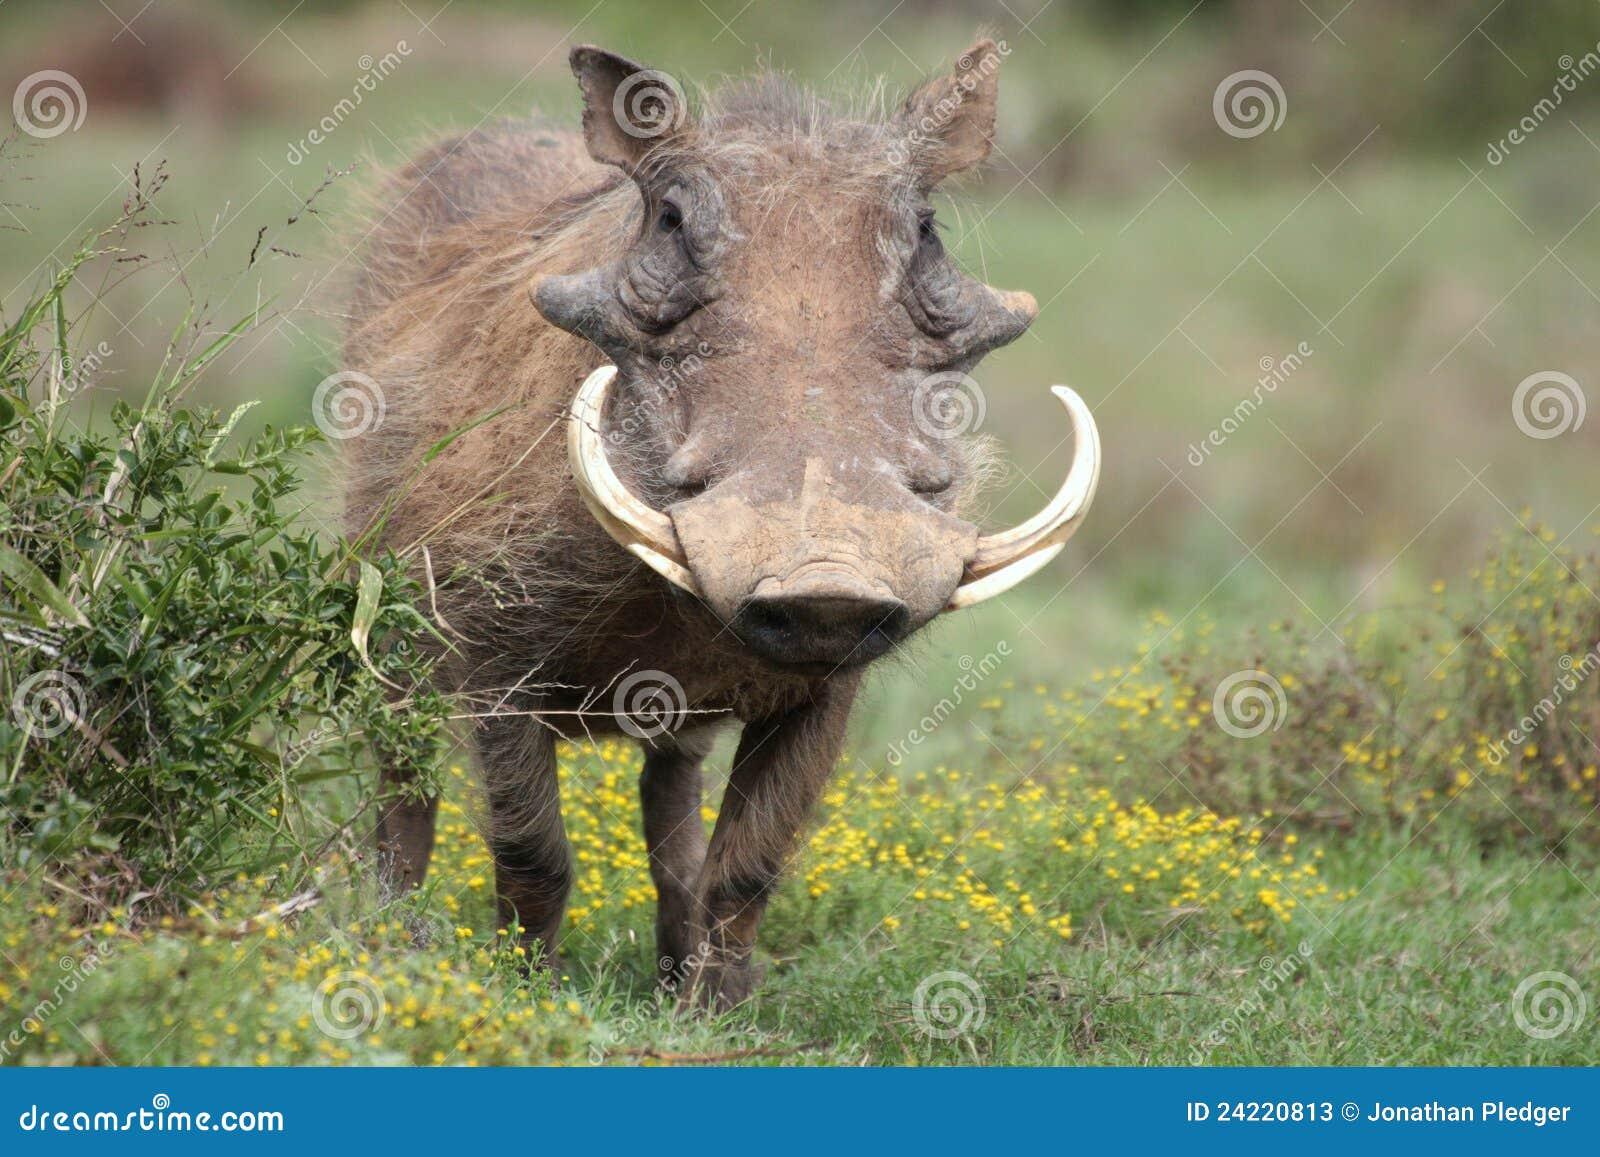 A warthog with big tusks.